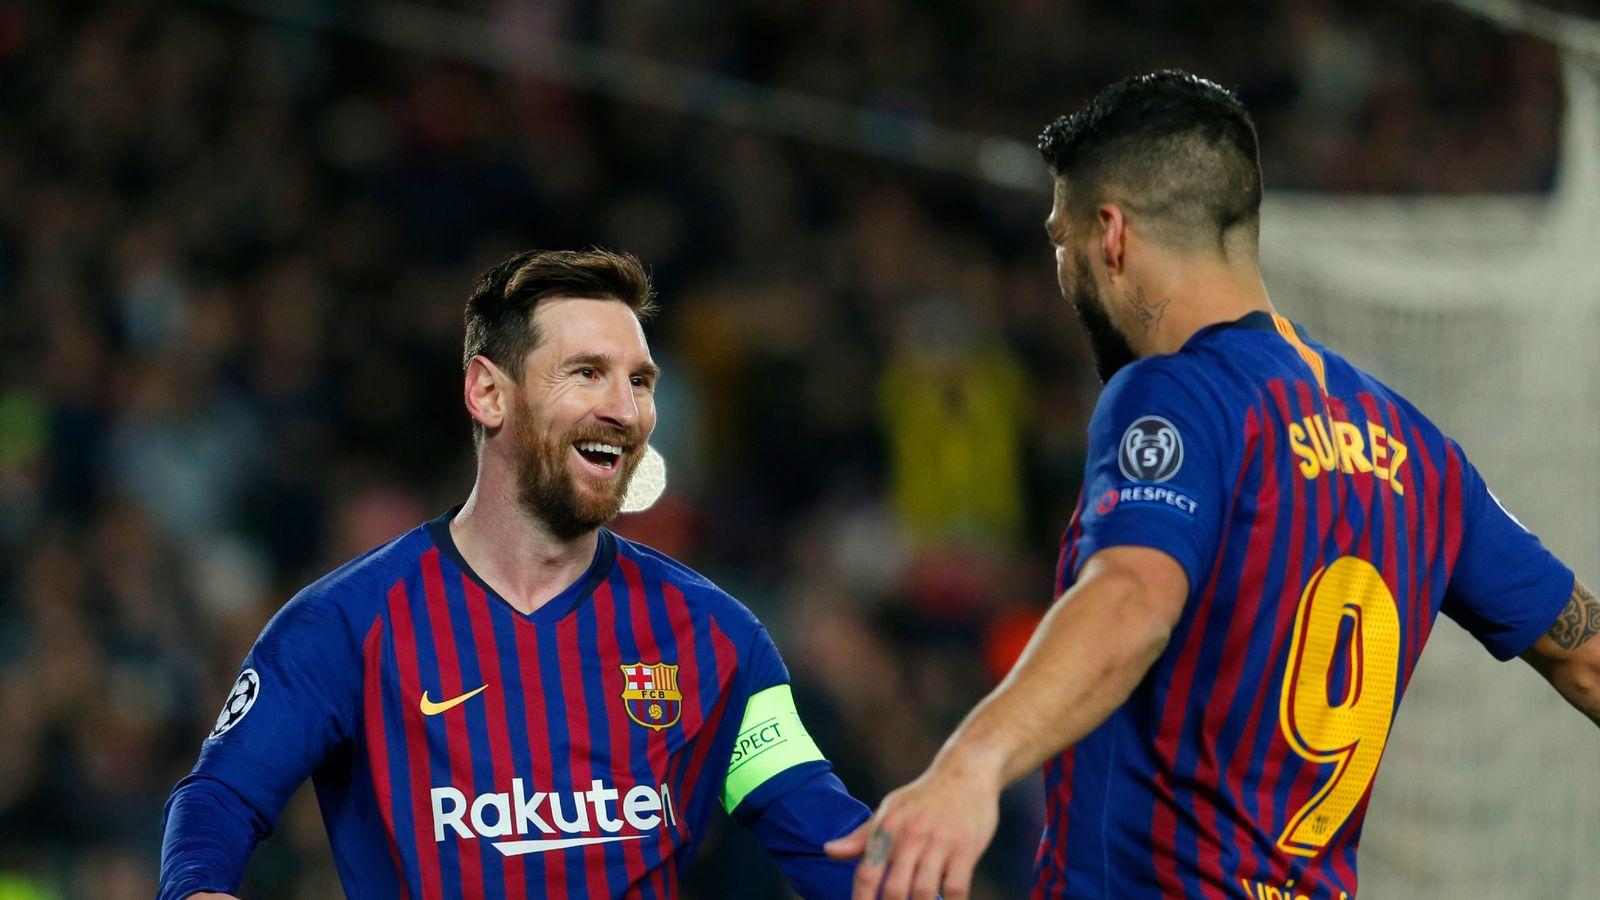 Messi Ballon d'Or snub would be strange - Valverde | FOX ...  |Lionel Messi